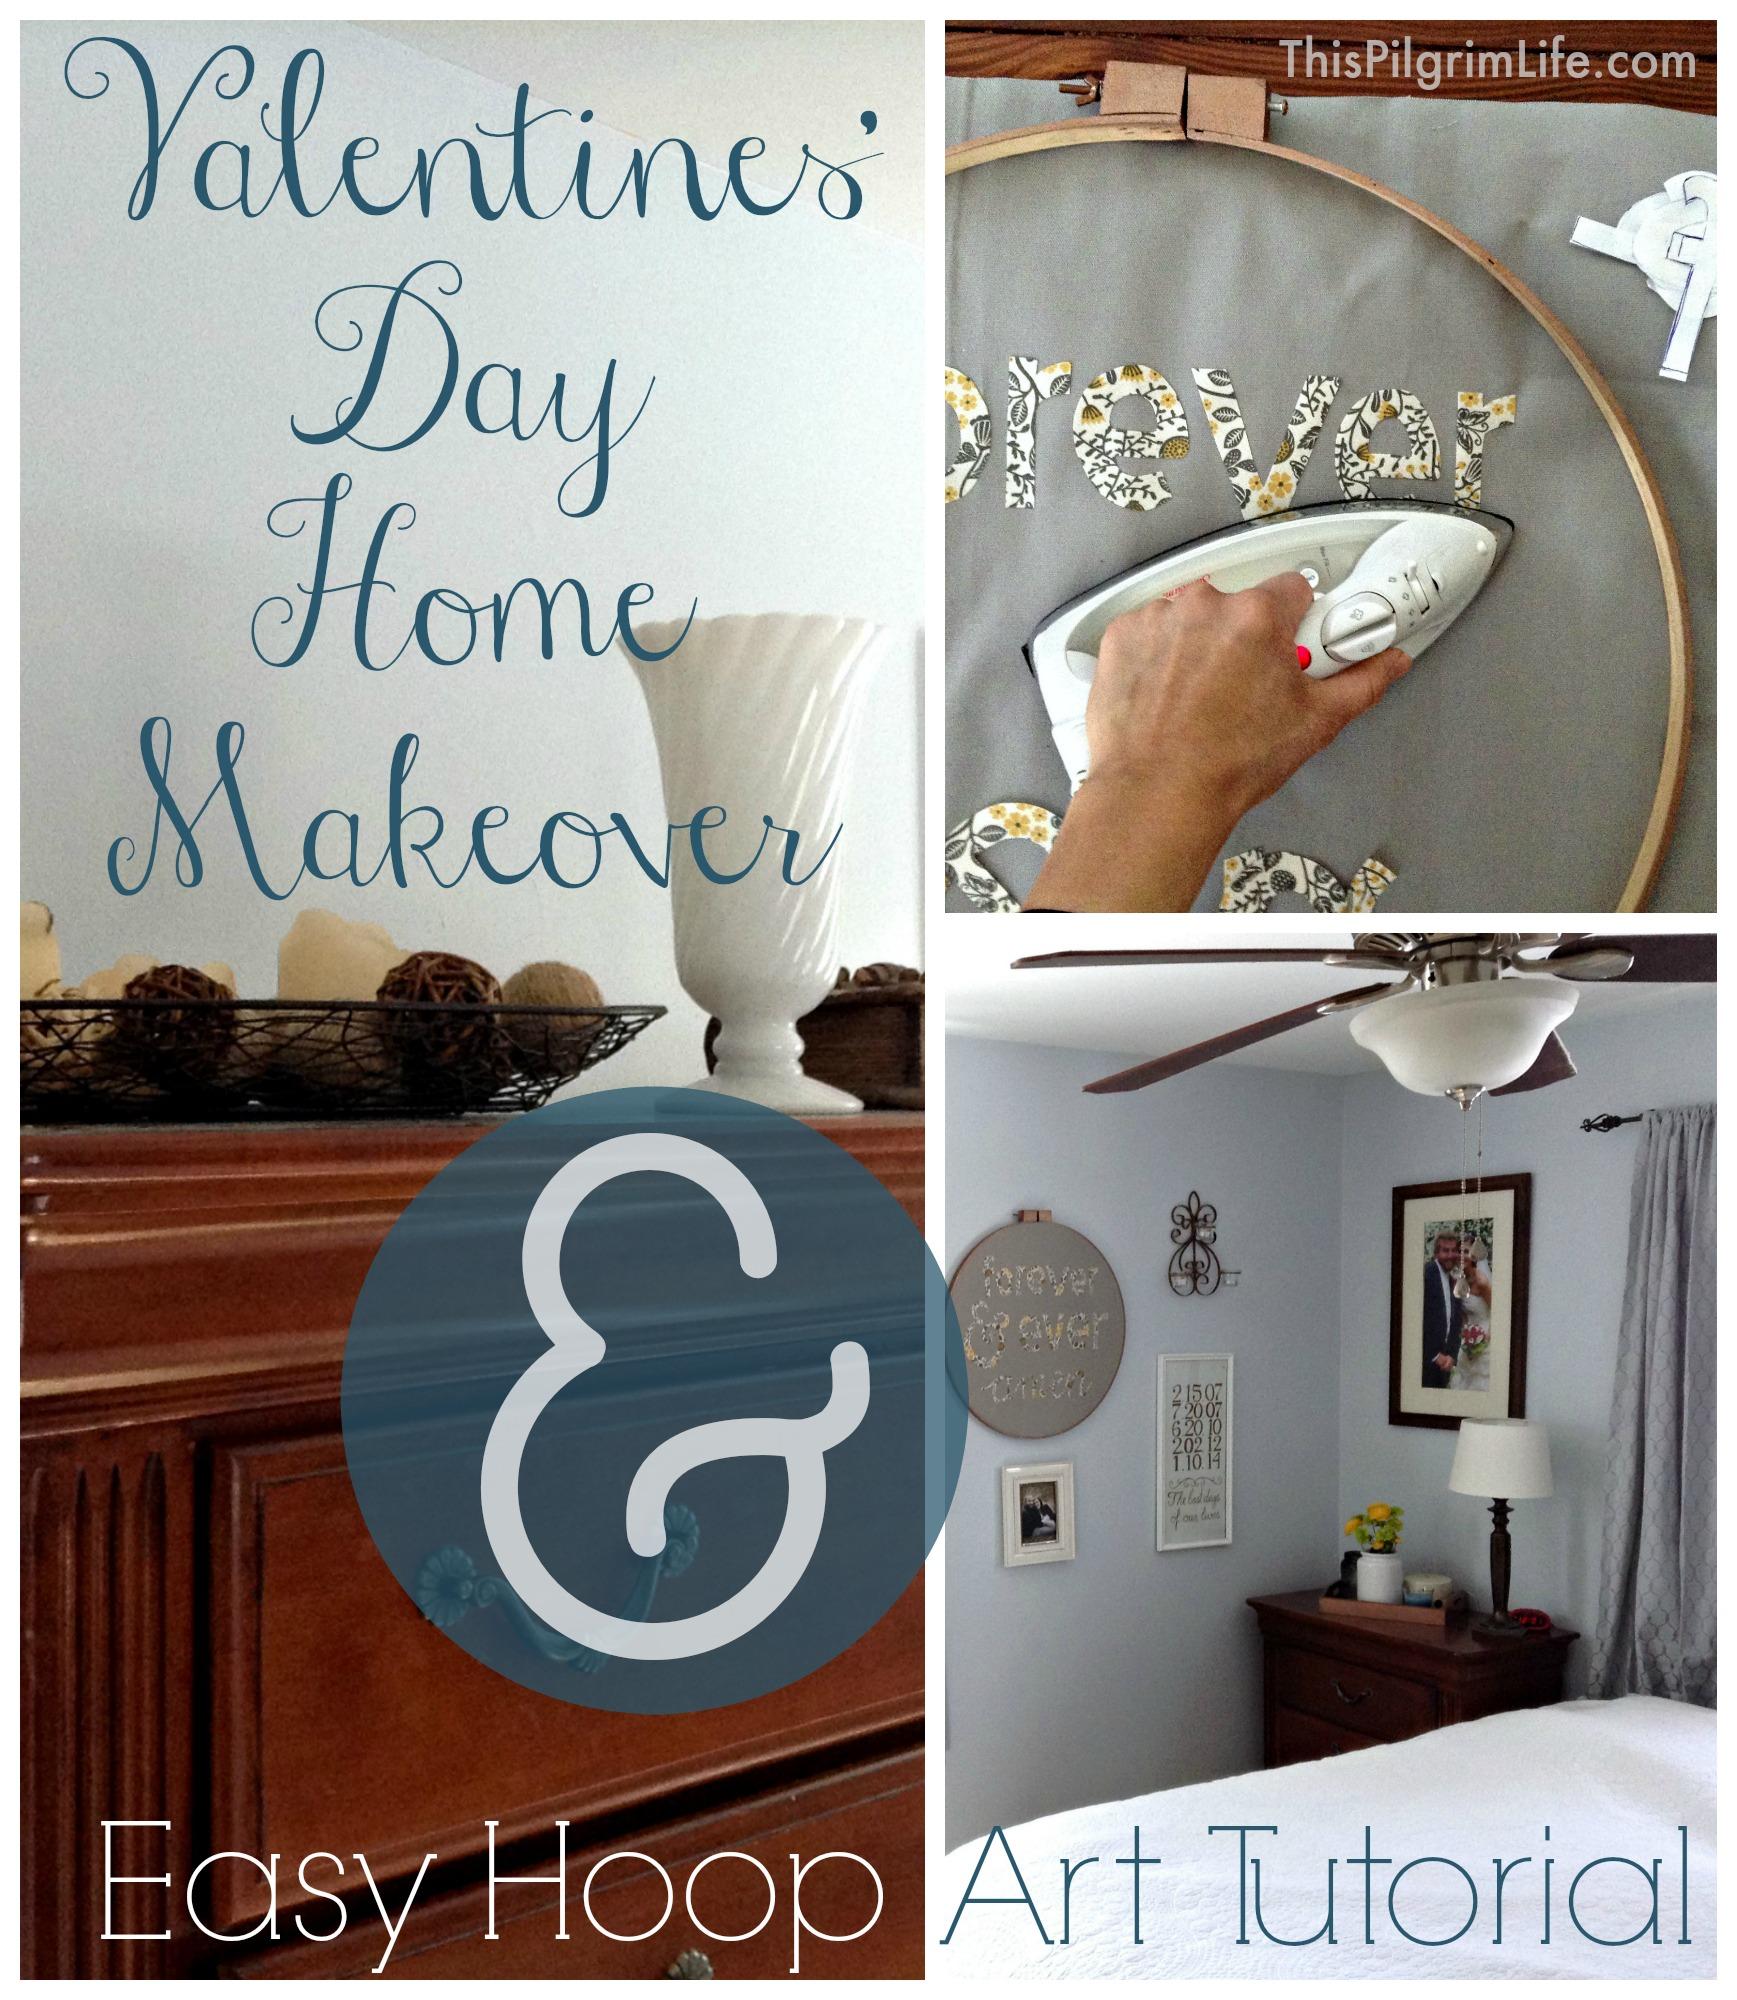 Valentine's Day Home Makeover & Easy Hoop Art Tutorial